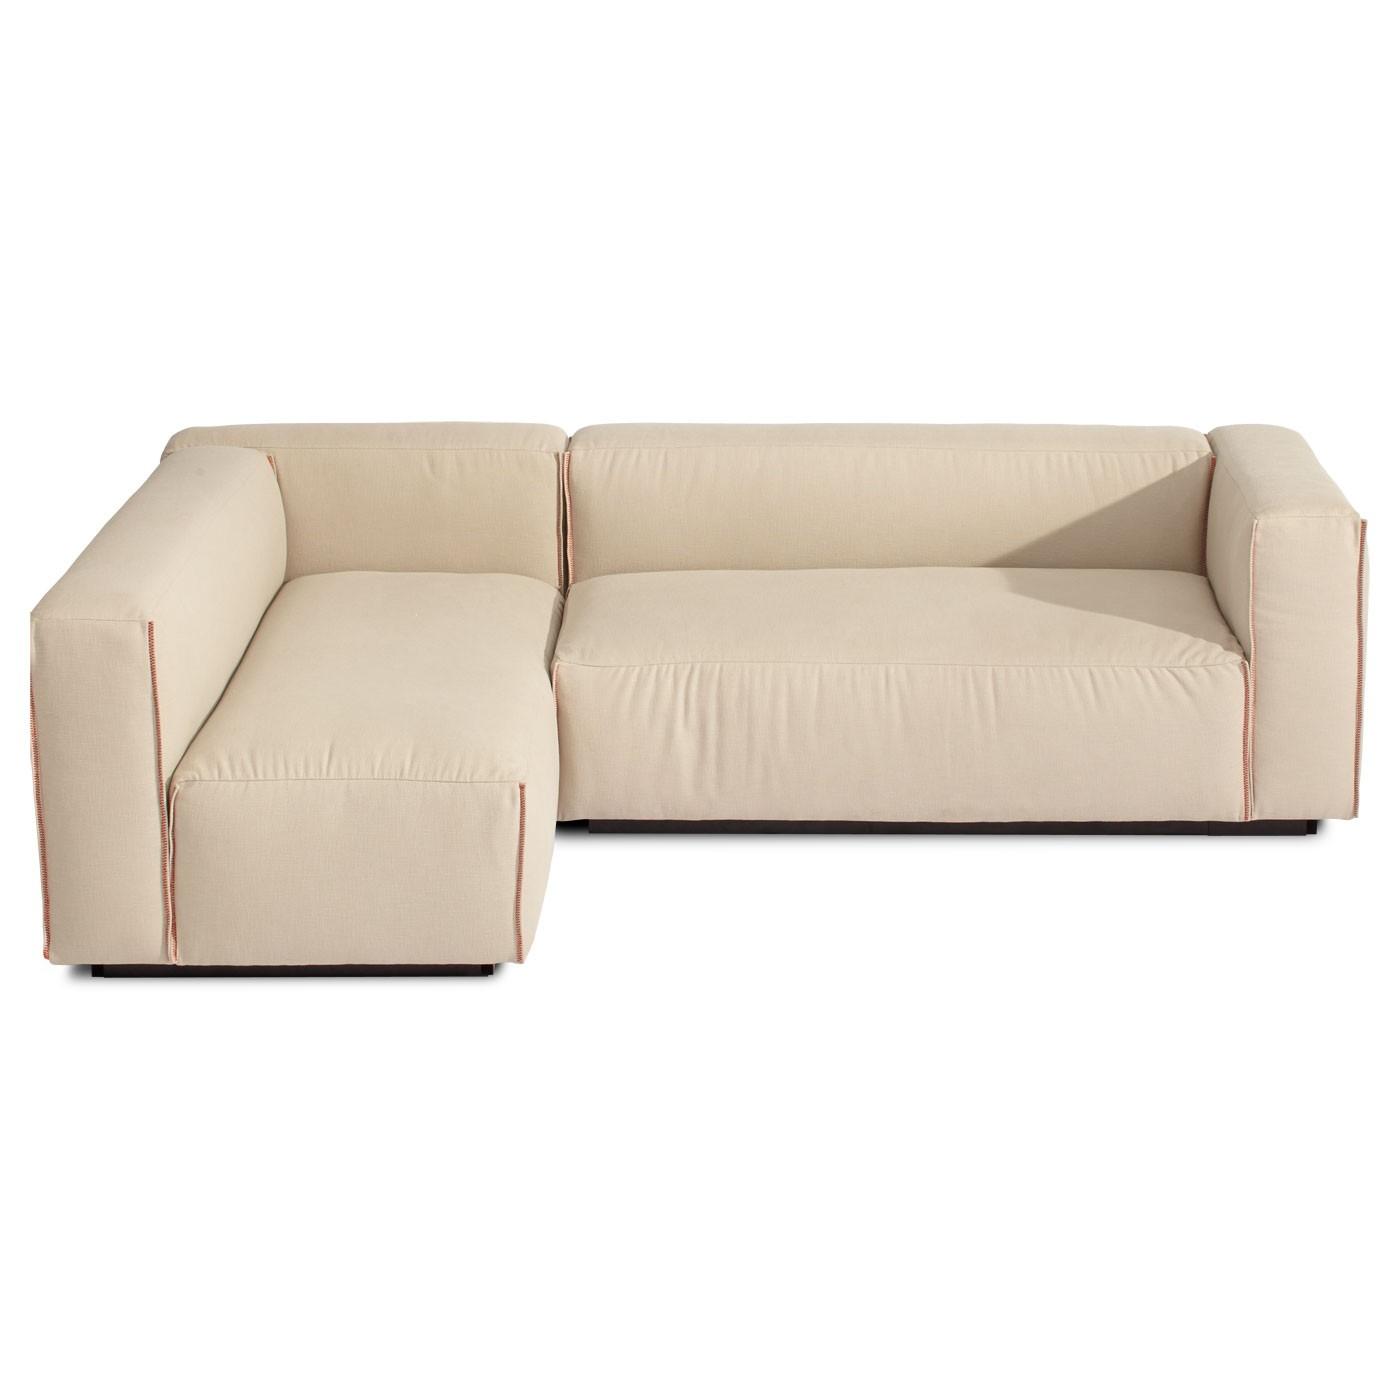 Small Sectional Sofa Wayfair